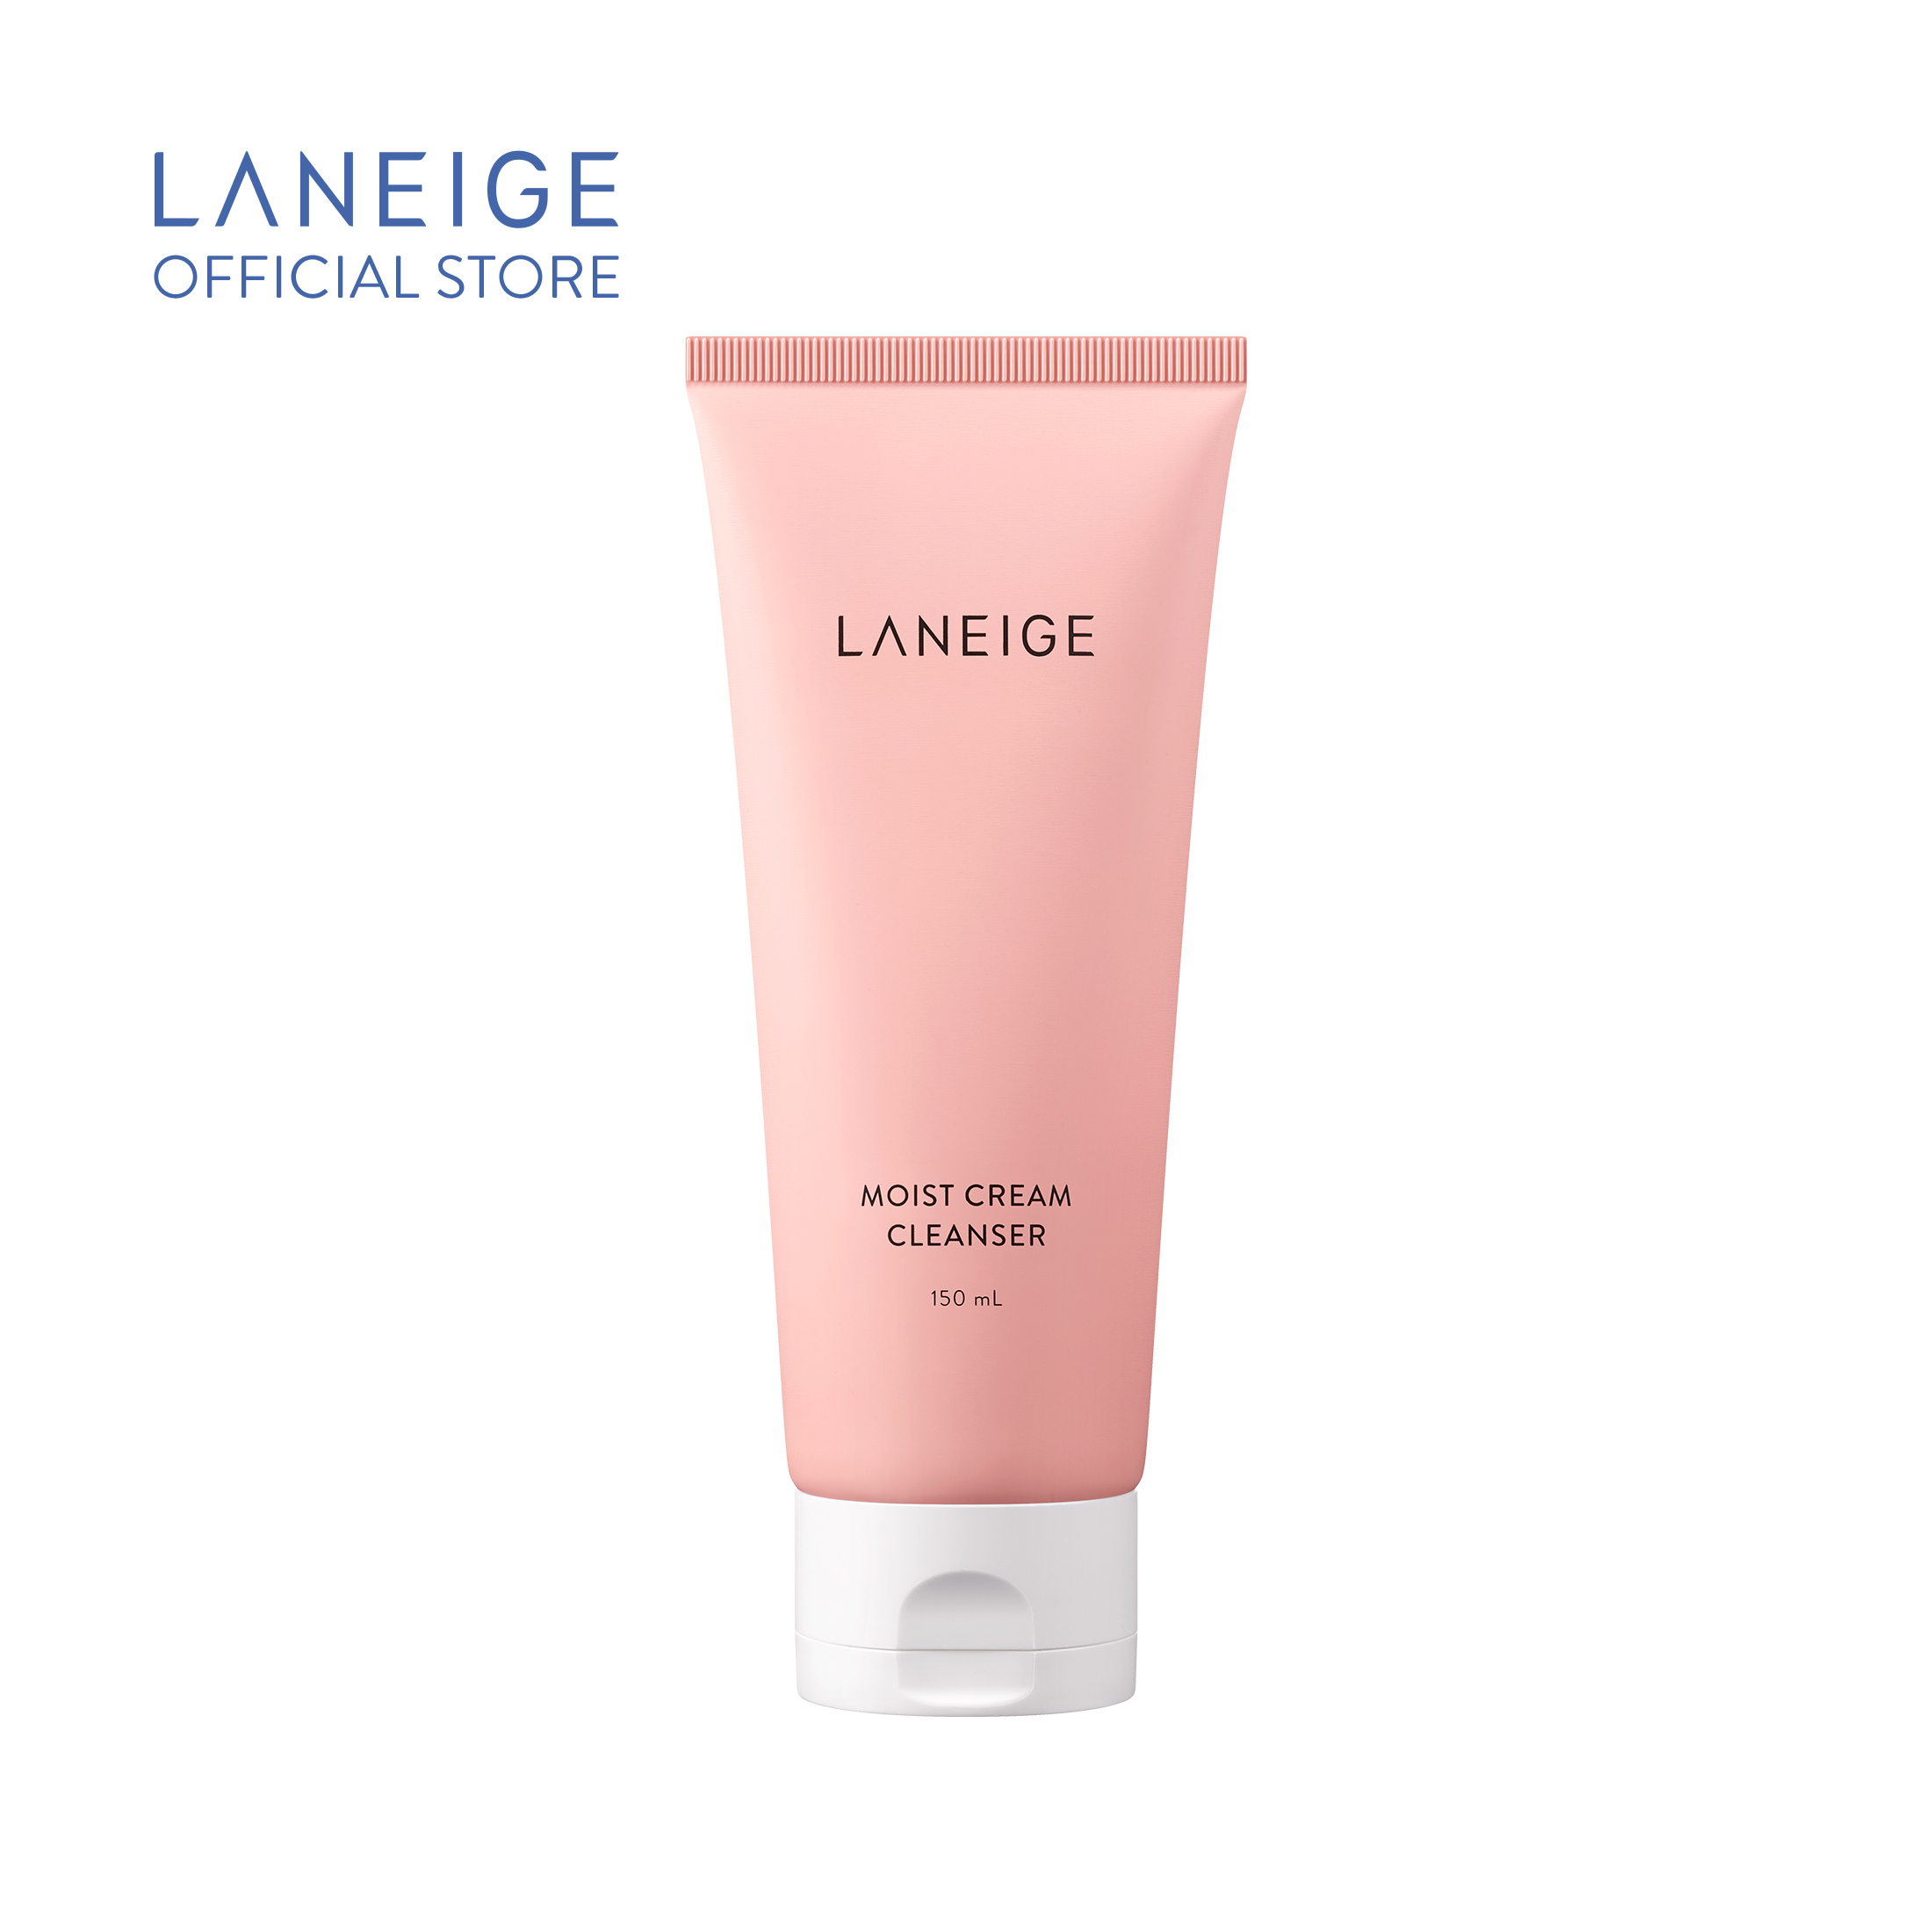 Sữa rửa mặt giúp dưỡng ẩm cho da thường và da khô Laneige Moist Cream Cleanser 150Ml